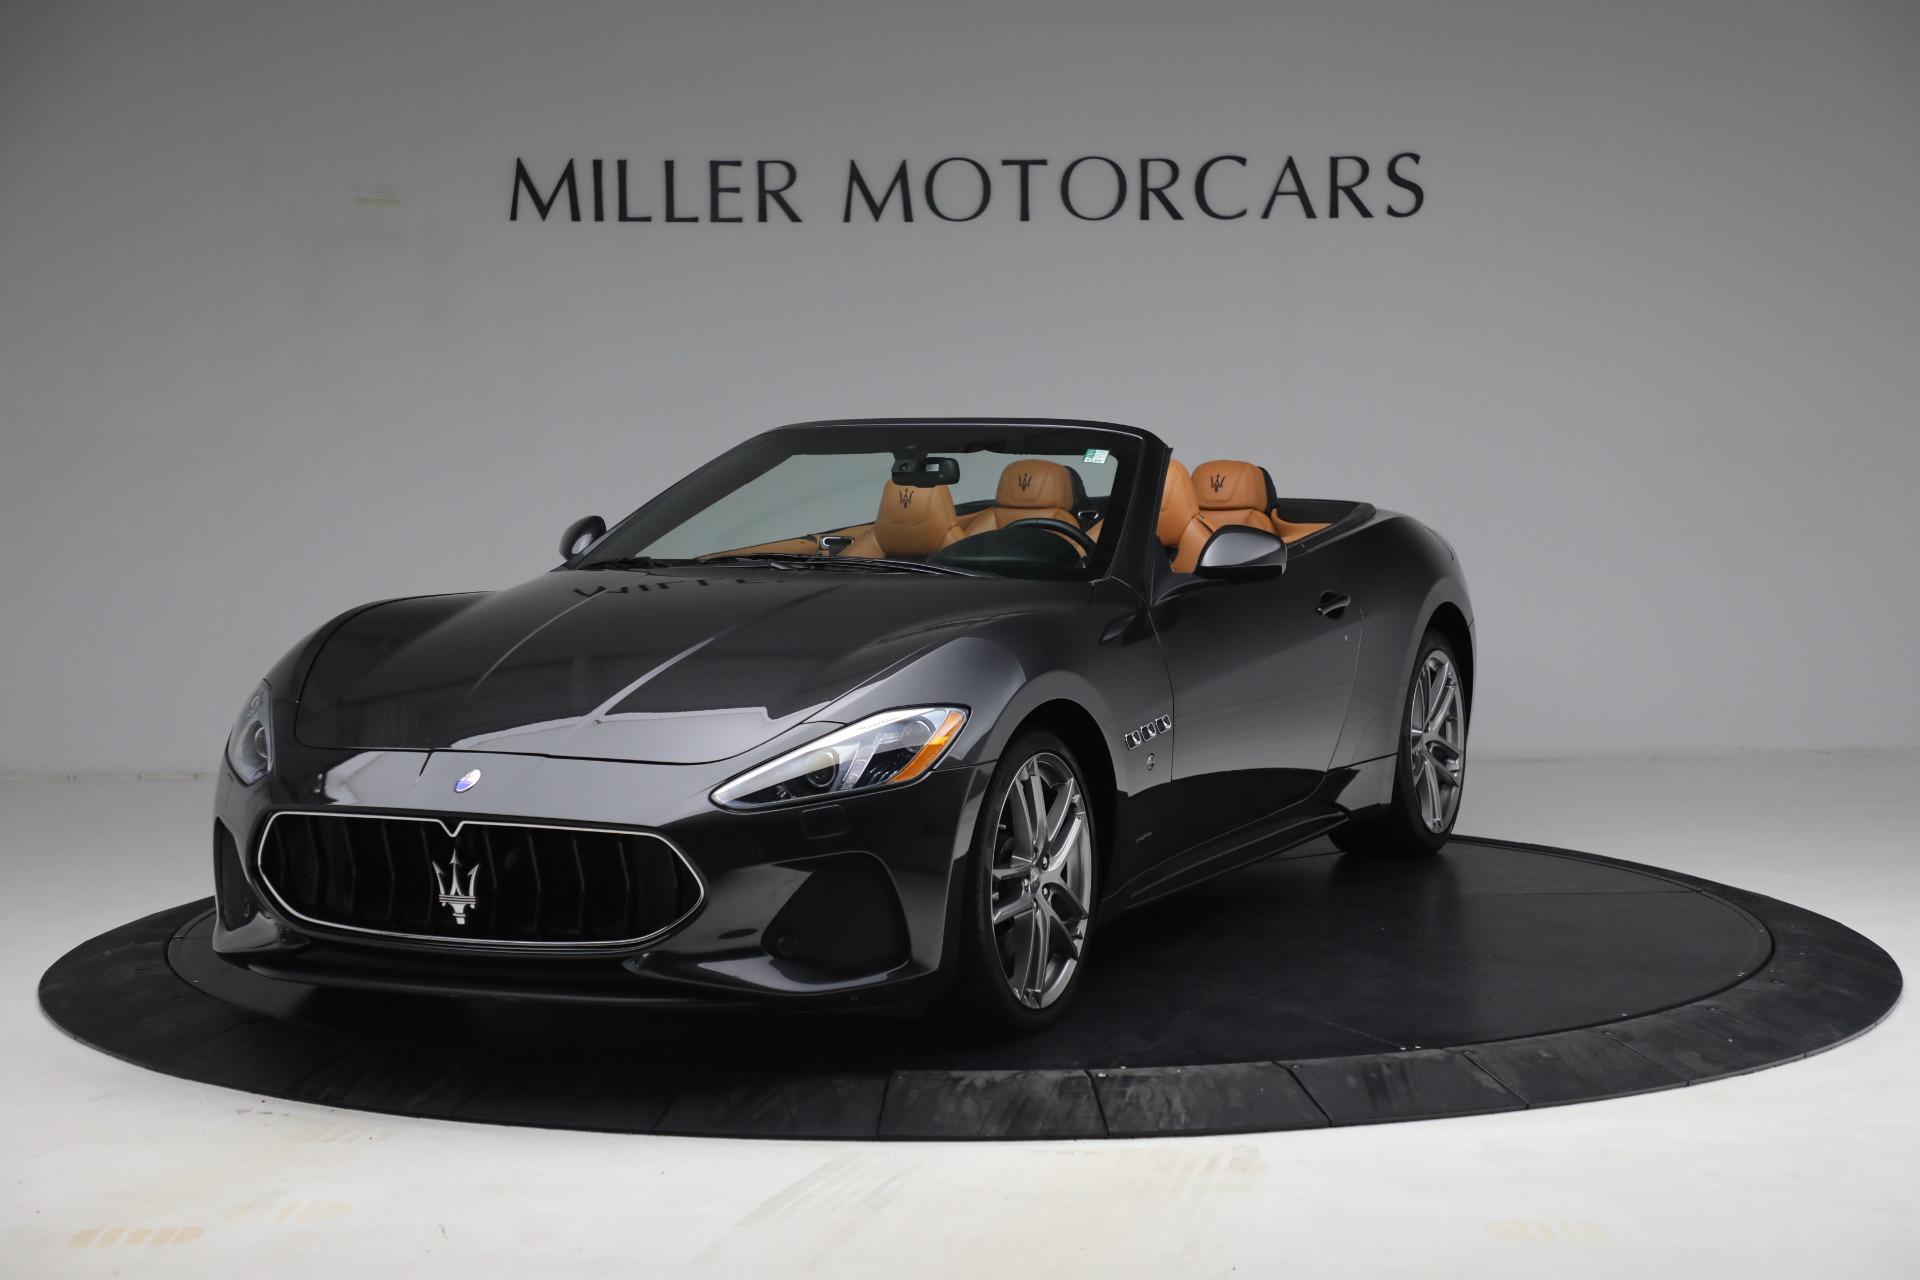 Used 2018 Maserati GranTurismo Sport for sale Call for price at McLaren Greenwich in Greenwich CT 06830 1